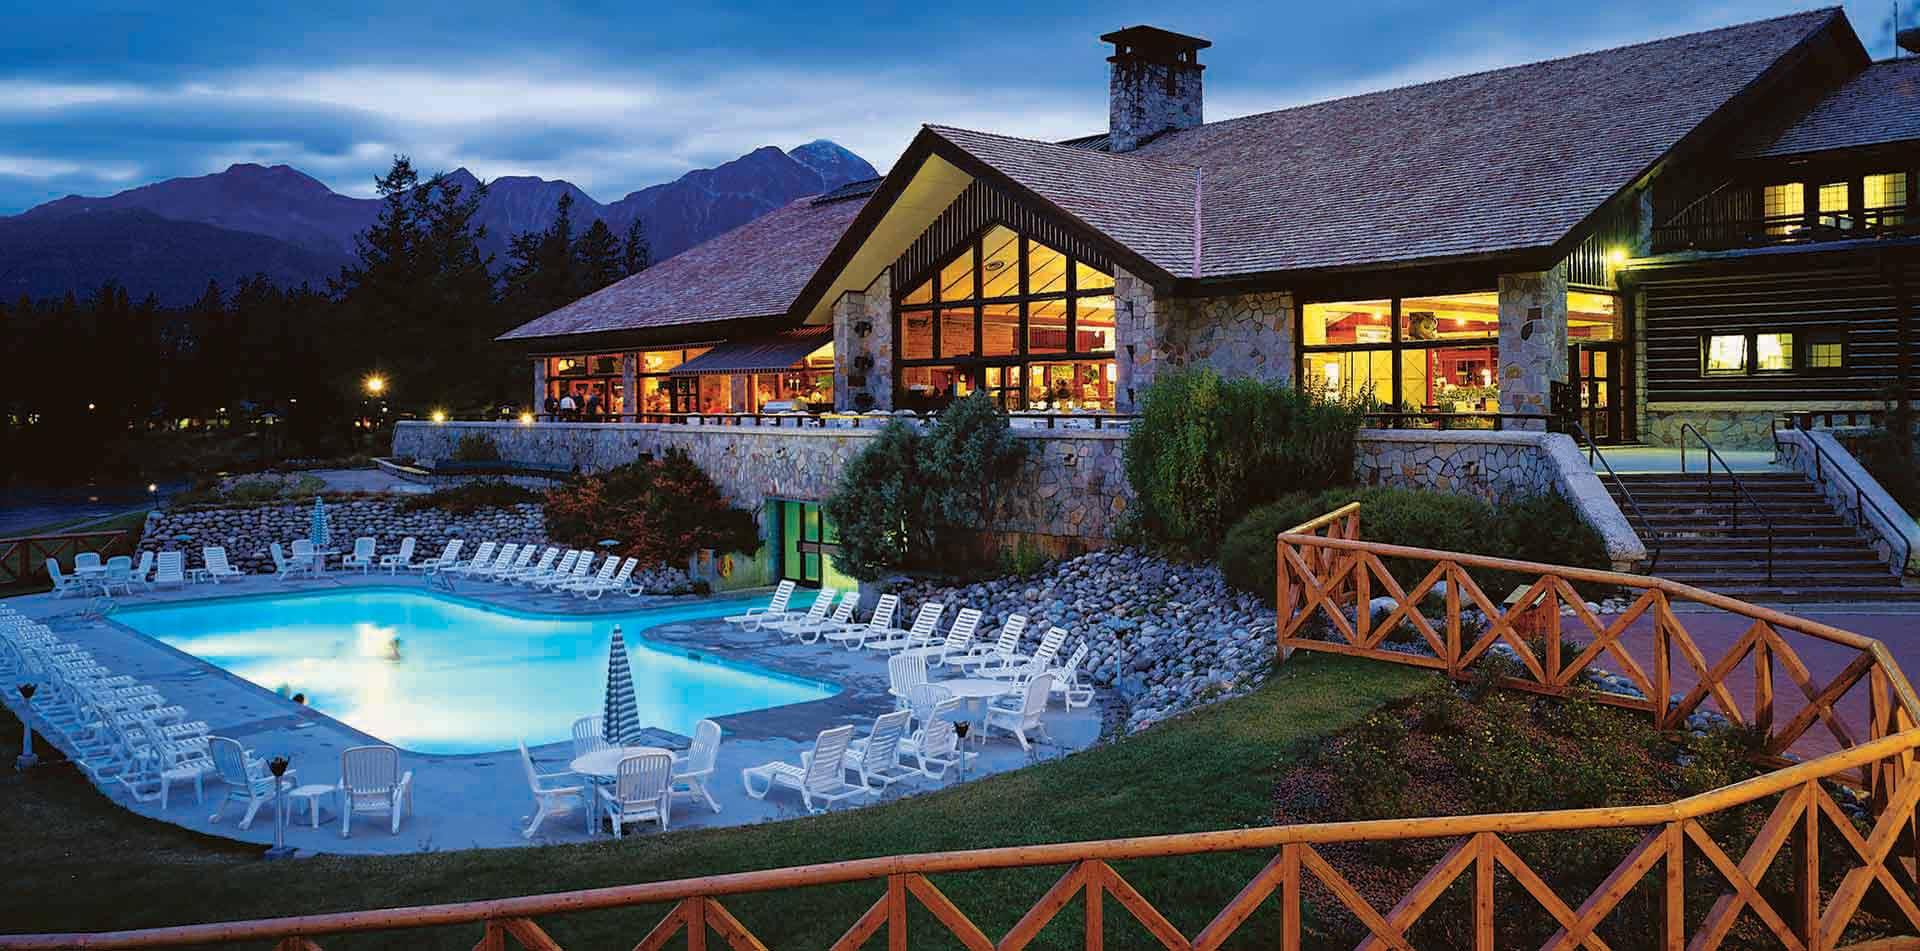 Fairmont Jasper Park Lodge Exterior, Canadian Rockies